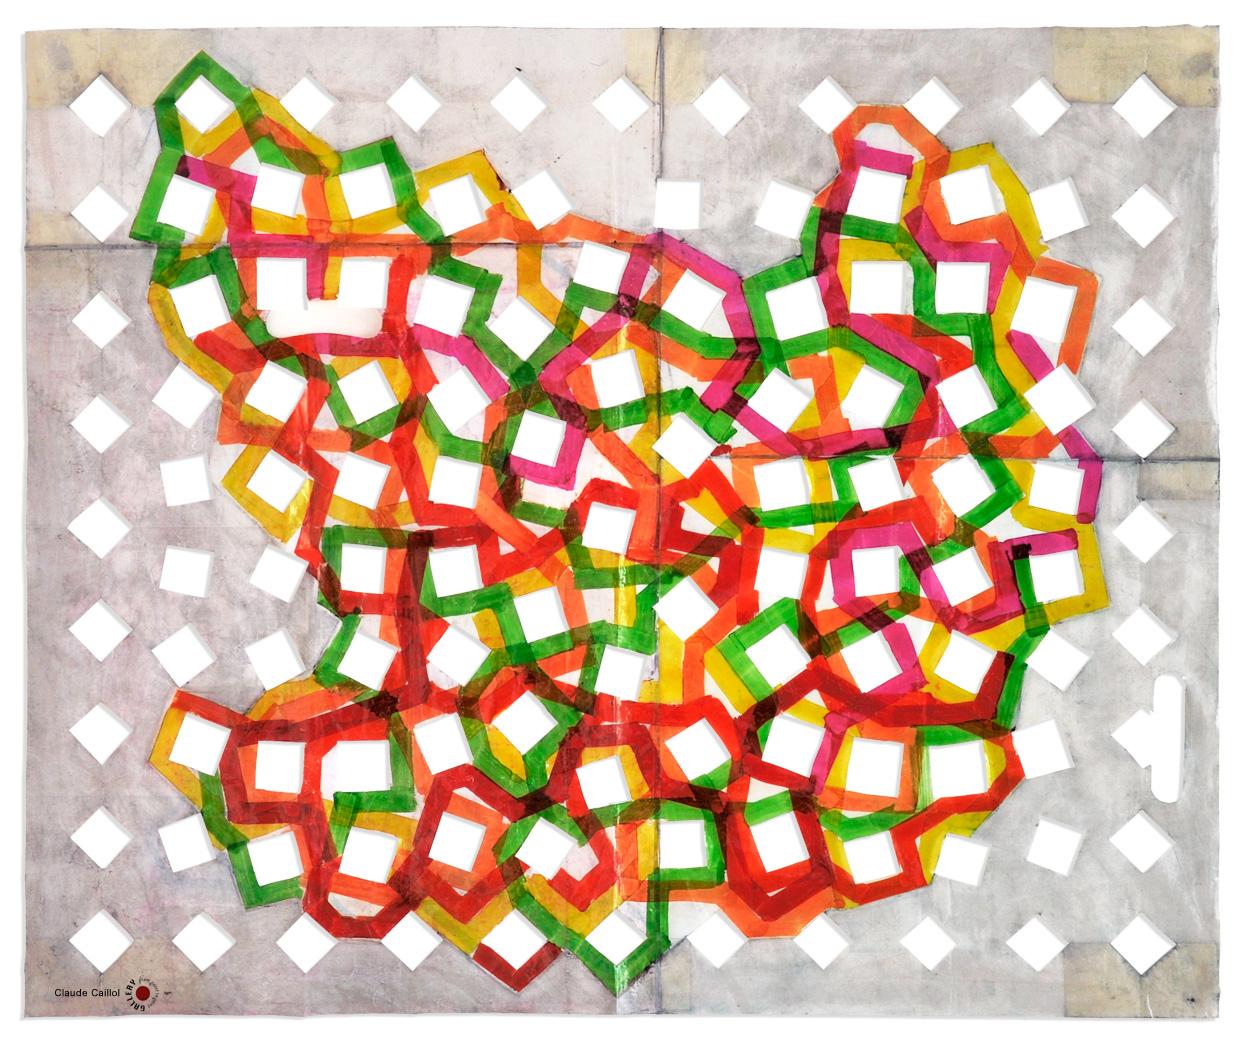 Caillol-Claude-peinture-vert-Jaune-Rouge-Point-to-Point-Studio.jpg